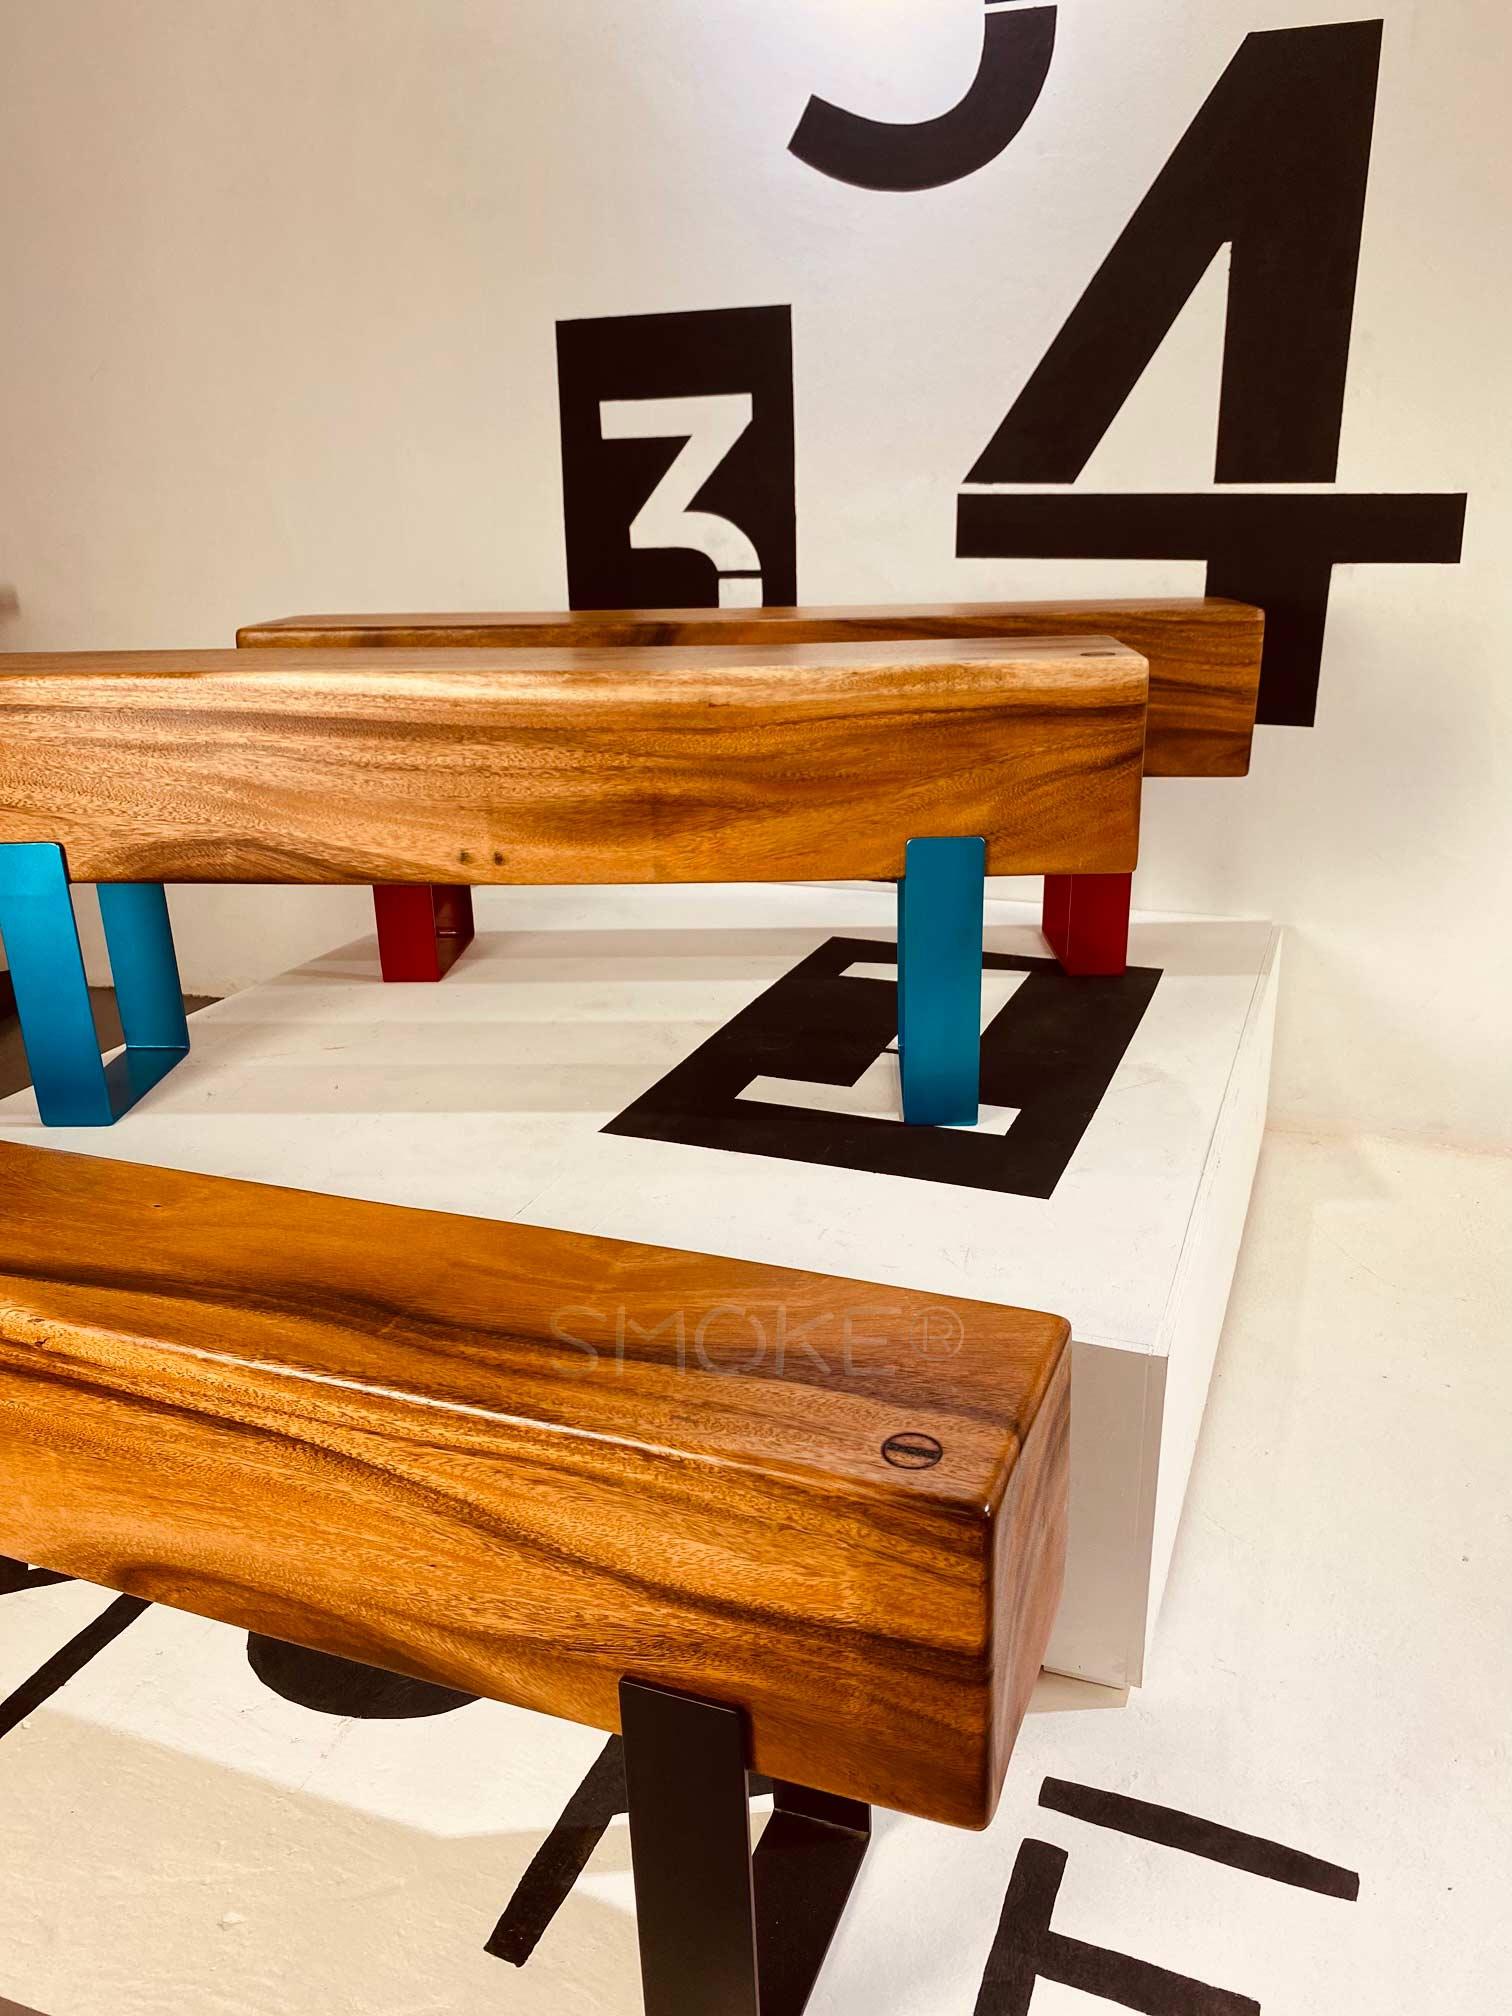 Logan Wooden Bench Perspective Display 2